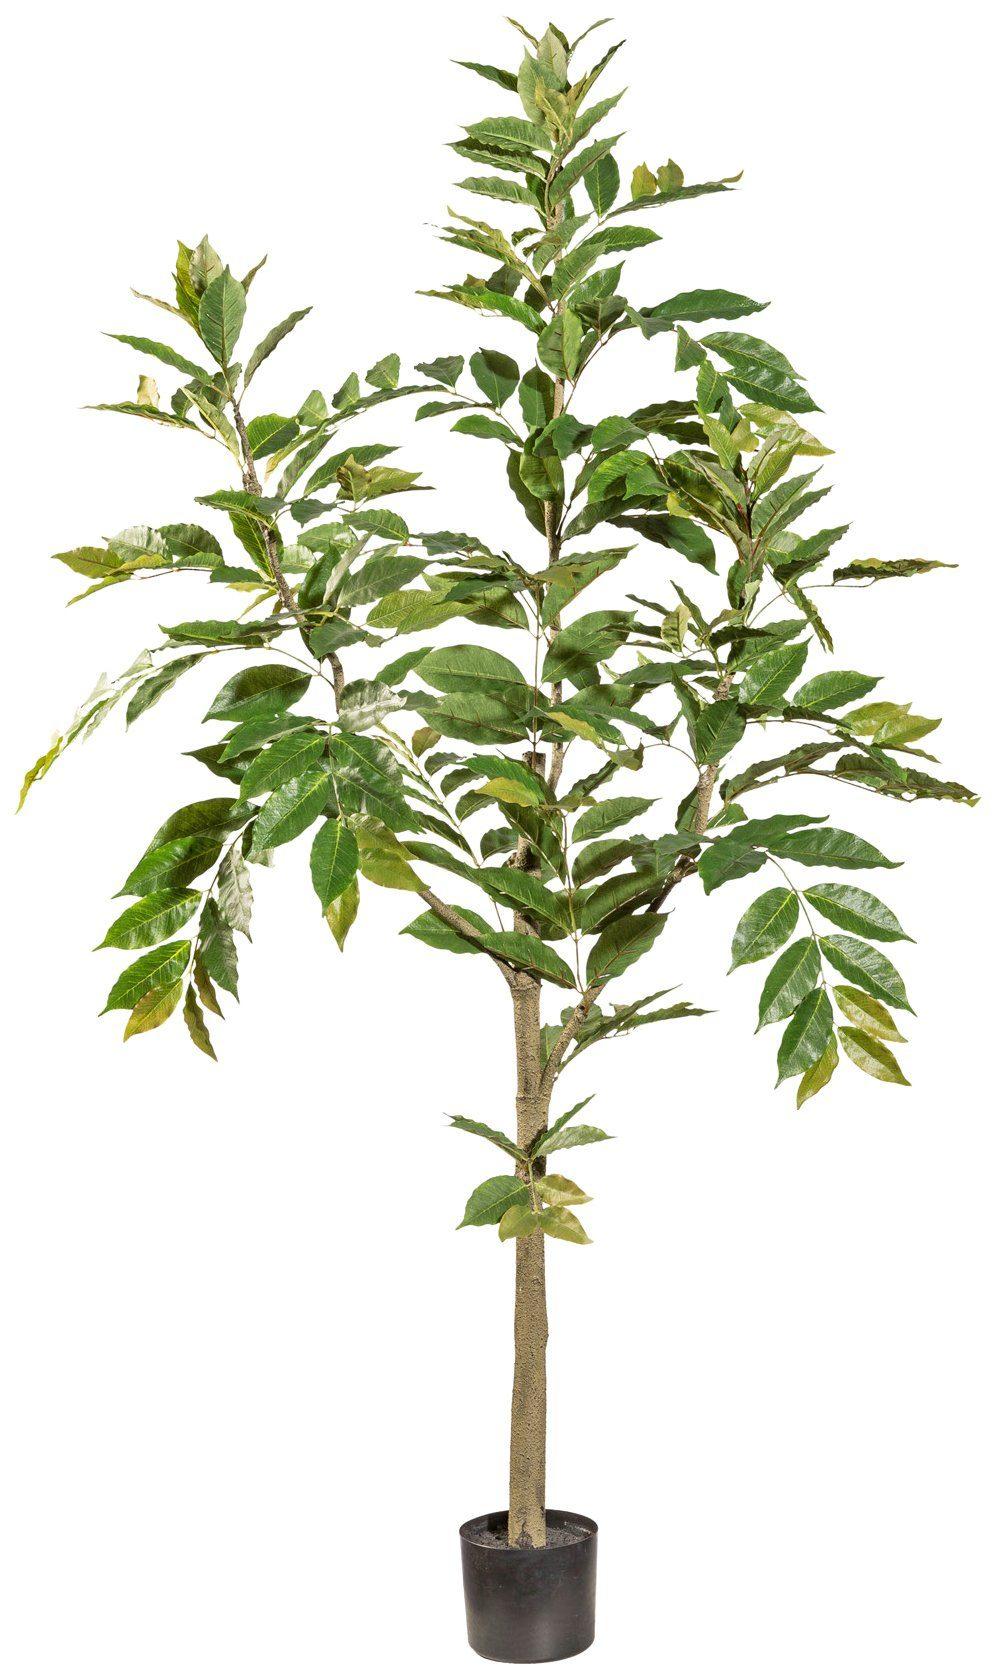 Kunstpflanze »Himmelsbambus«, im Kunststofftopf, H: 180 cm